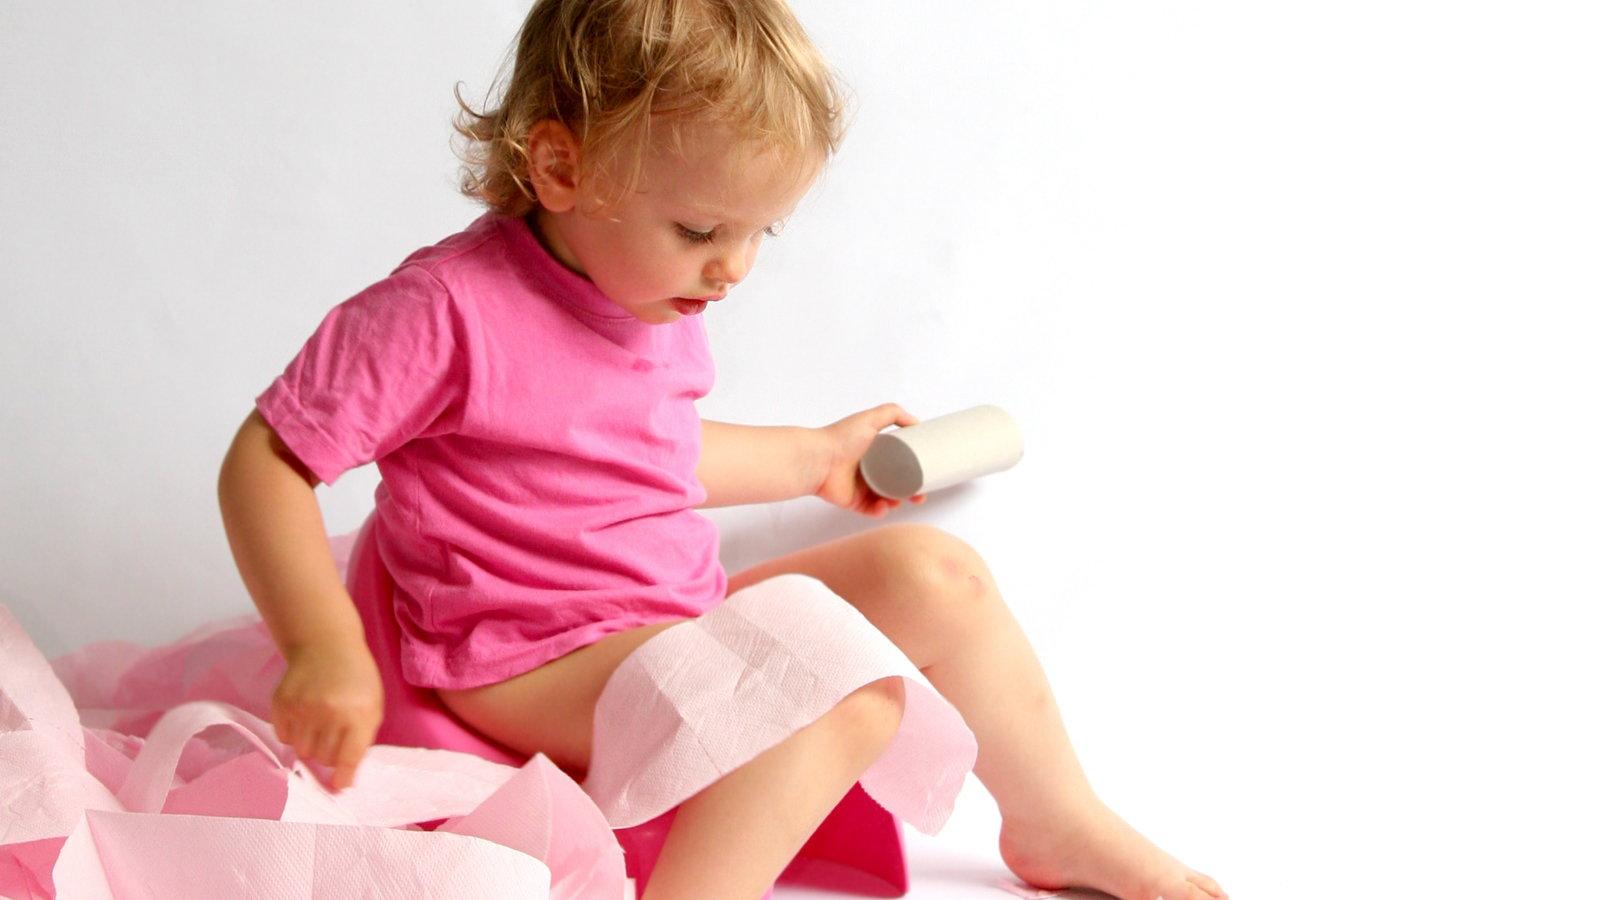 little girl on potty seat